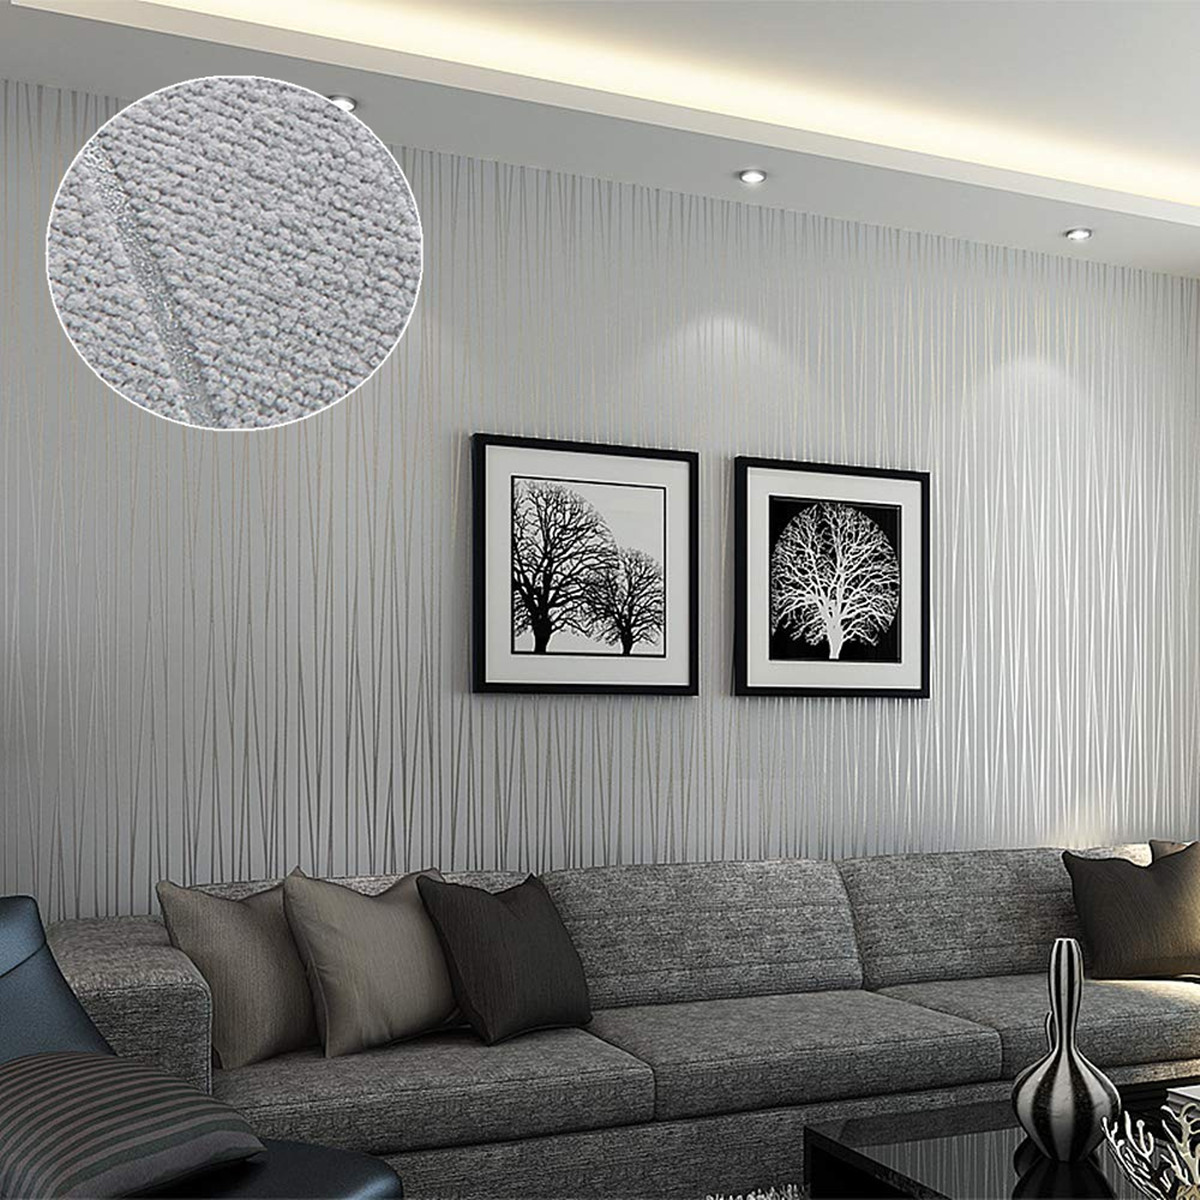 (1.75 x 33 FT ) Paintable Prepasted 3D Non-Woven Modern Wallpaper Stripes Damask Textured Embossed Flocking Classic Plain Stripe Wallpaper Roll For Livingroom Bedroom Removable